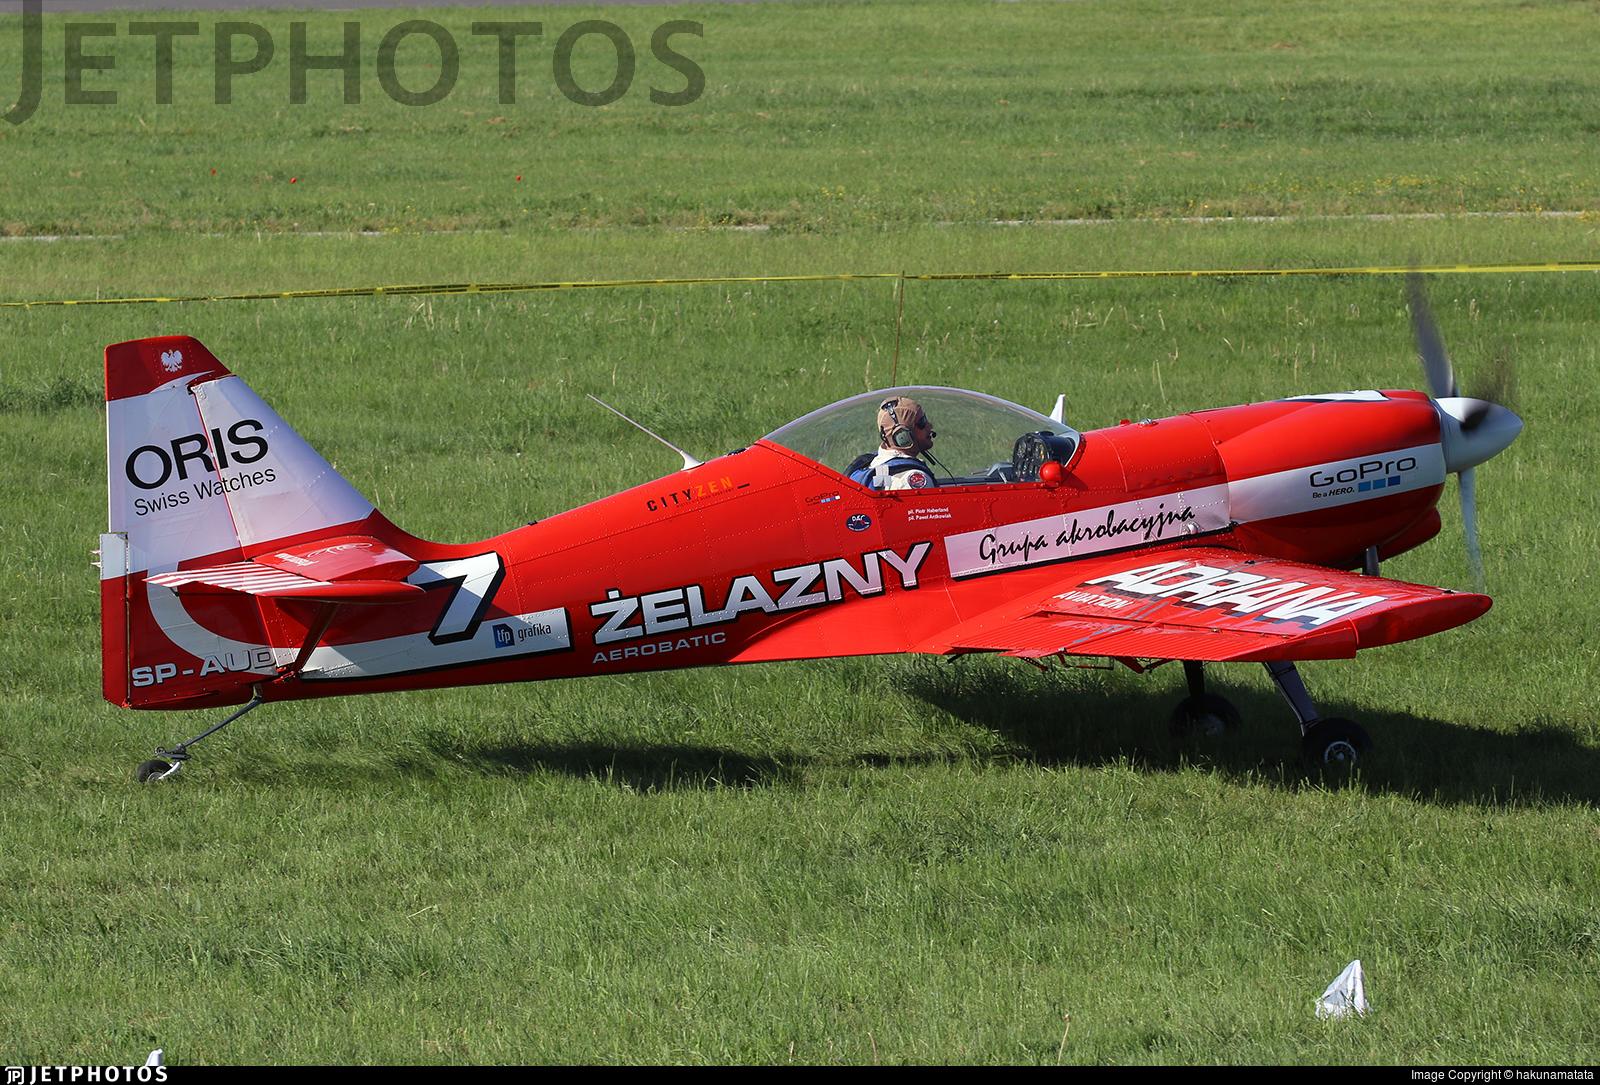 SP-AUD - Zlin 50LS - Zelazny Aerobatic Team